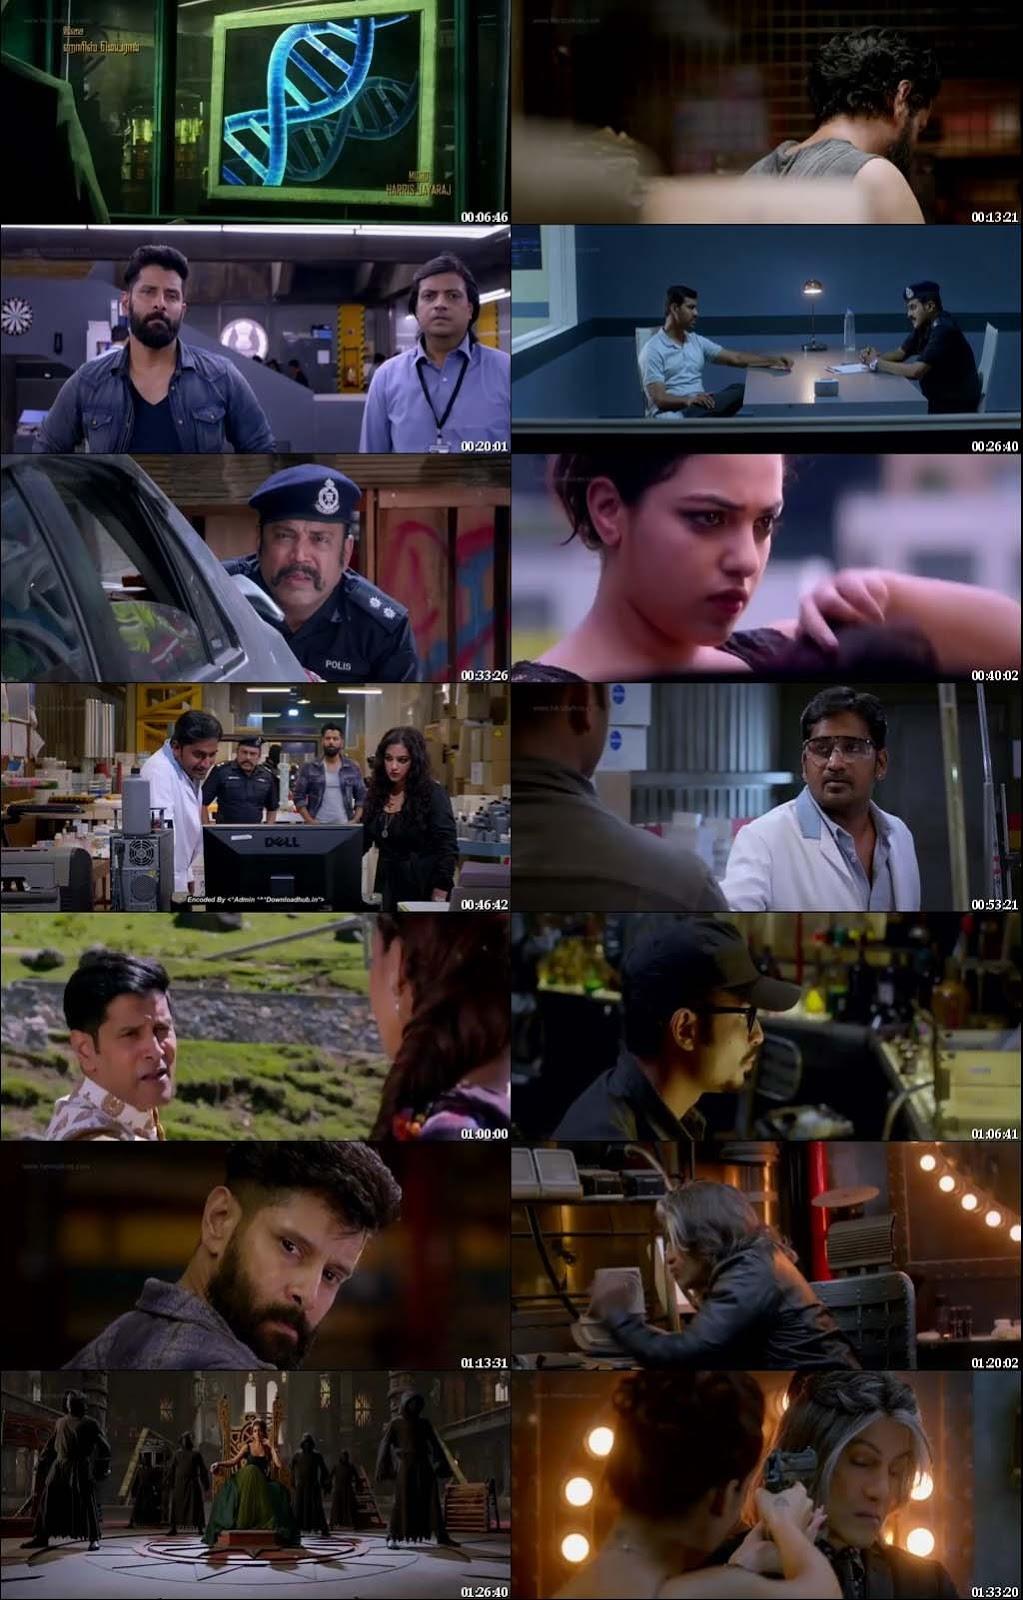 Iru Mugan (2016) full movie in hindi download 300mb